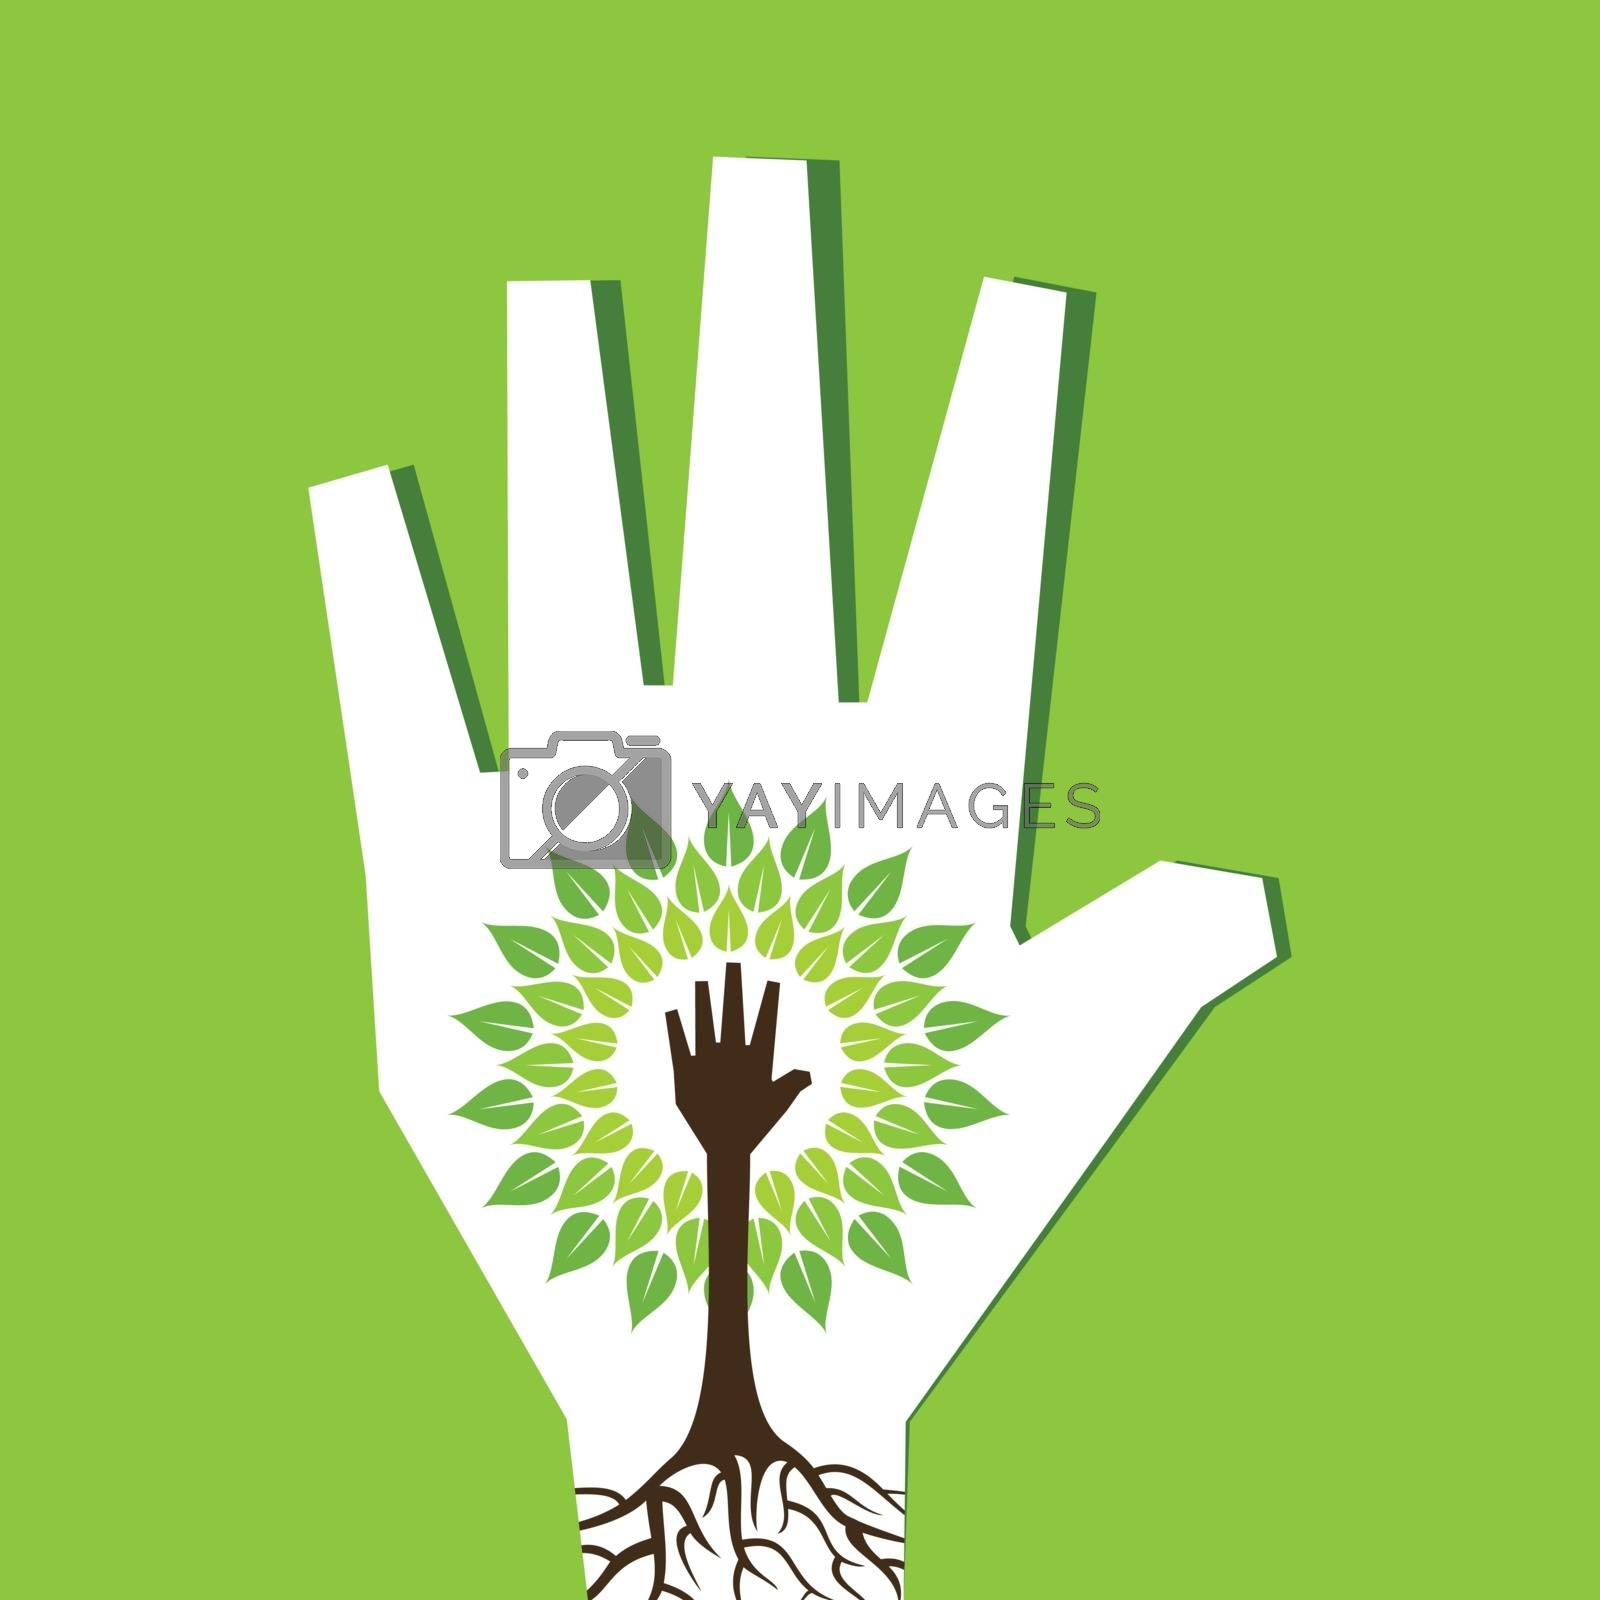 Helping hand make tree inside the tree- vector illustration